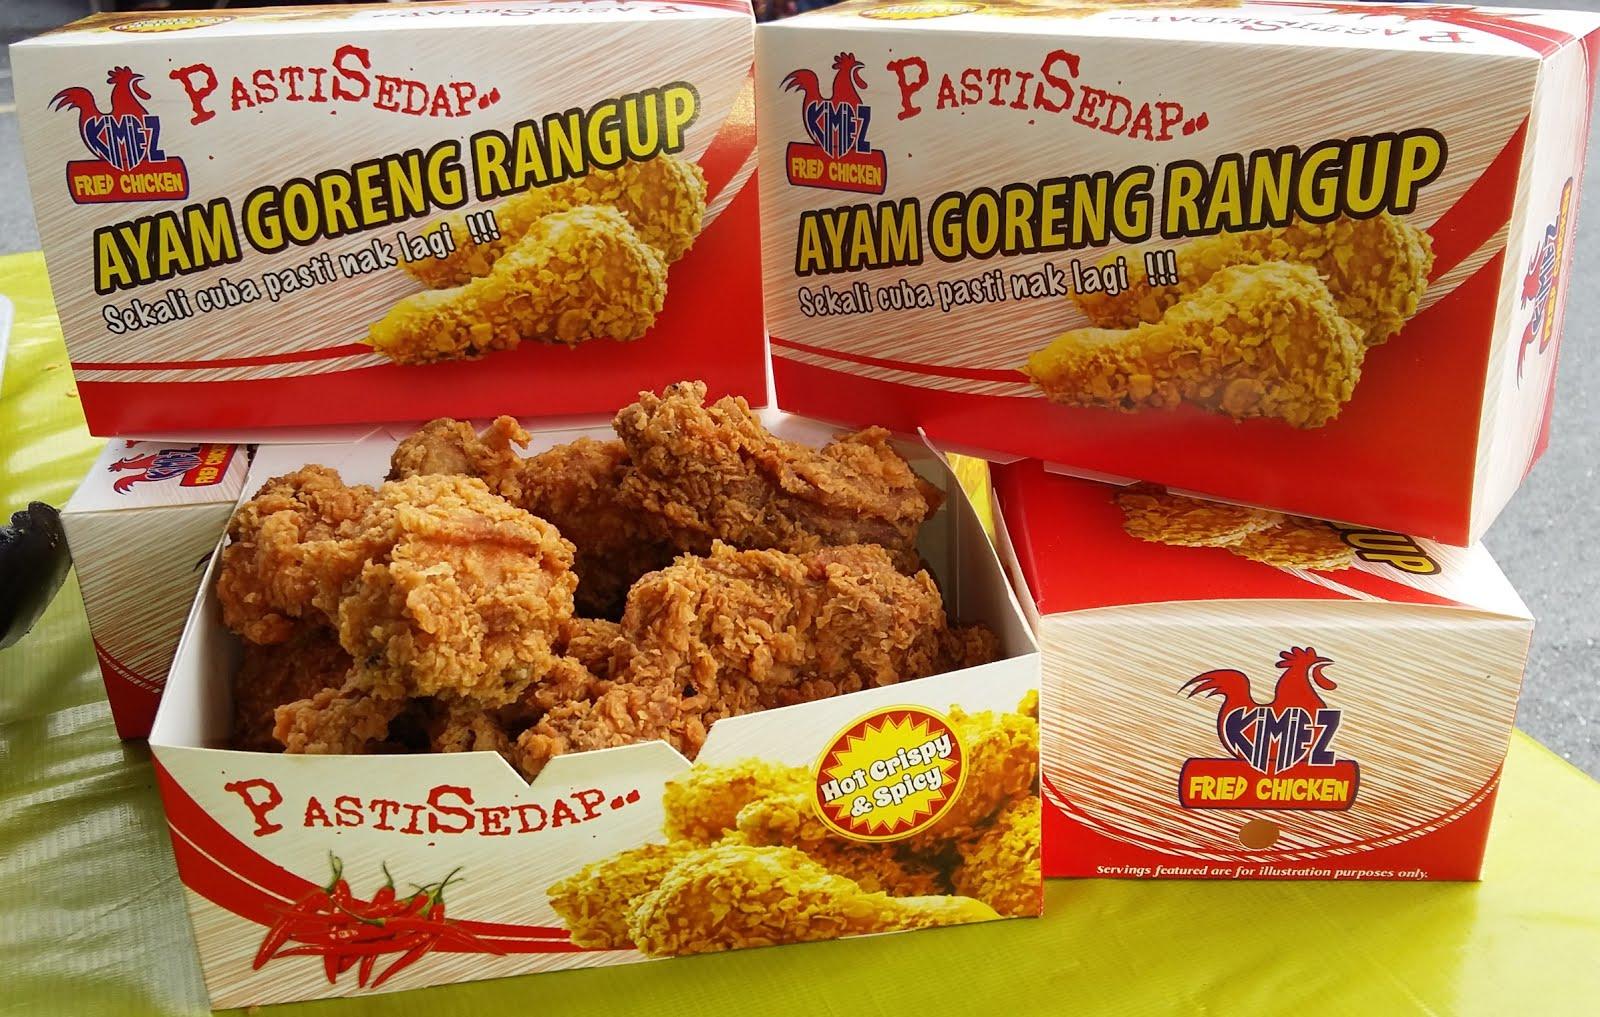 Ayam goreng krukk krukk !